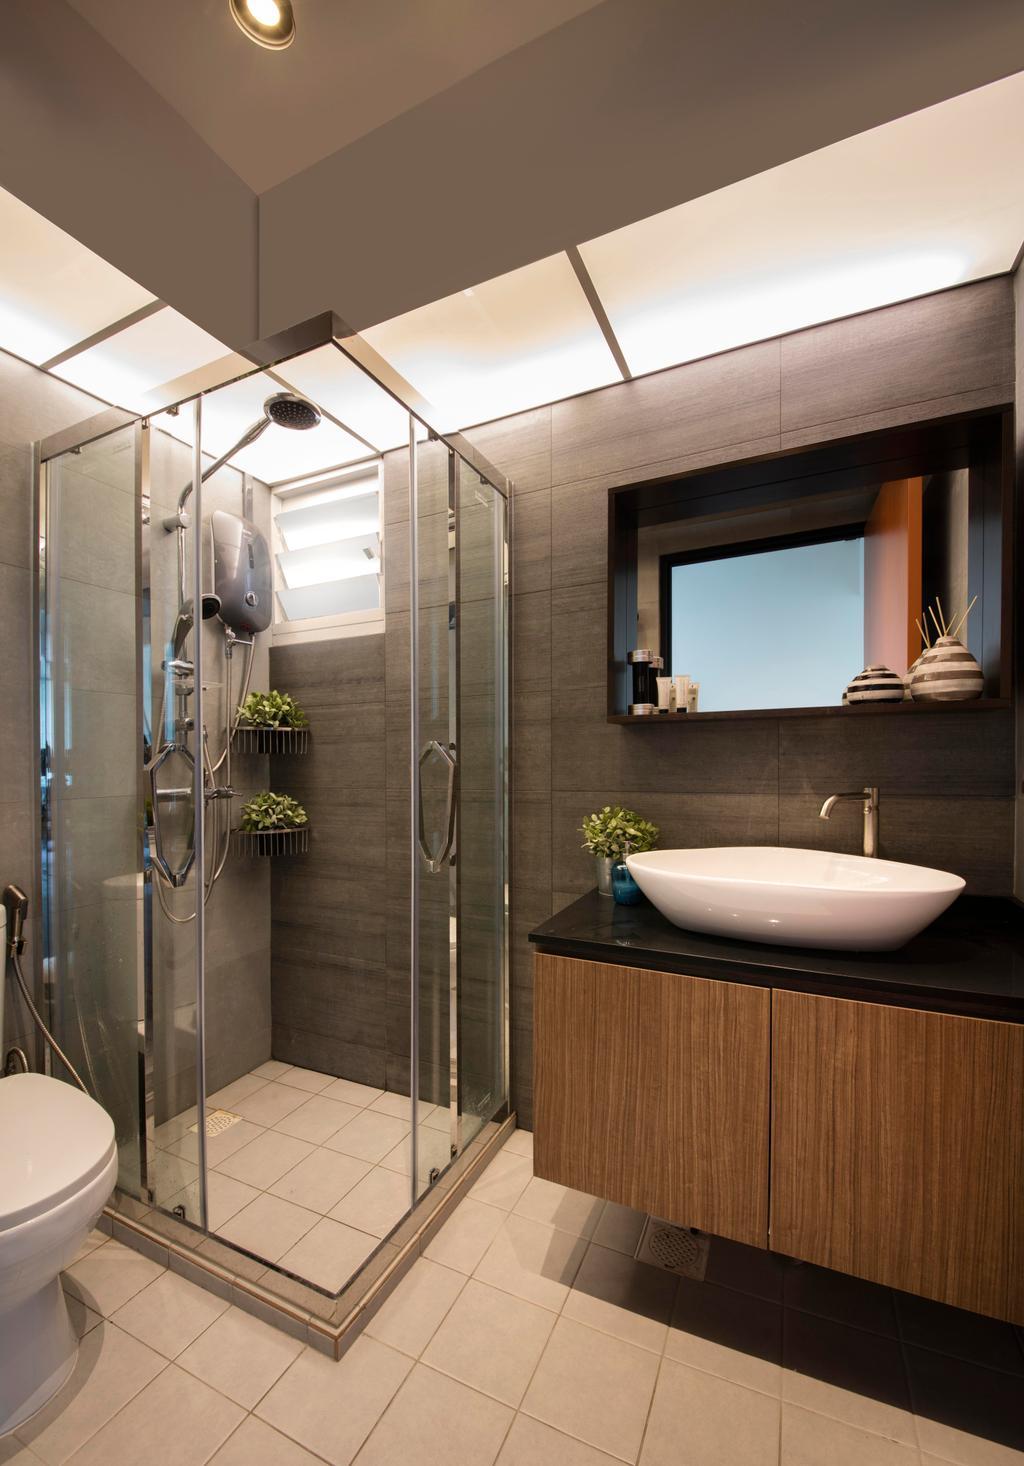 Scandinavian, HDB, Bathroom, Yishun (Block 316), Interior Designer, KDOT, Sink, Cabinets, Tiles, Wall Tiles, Shower Screen, Toilet Bowl, Mirror, Bowl, Indoors, Interior Design, Room